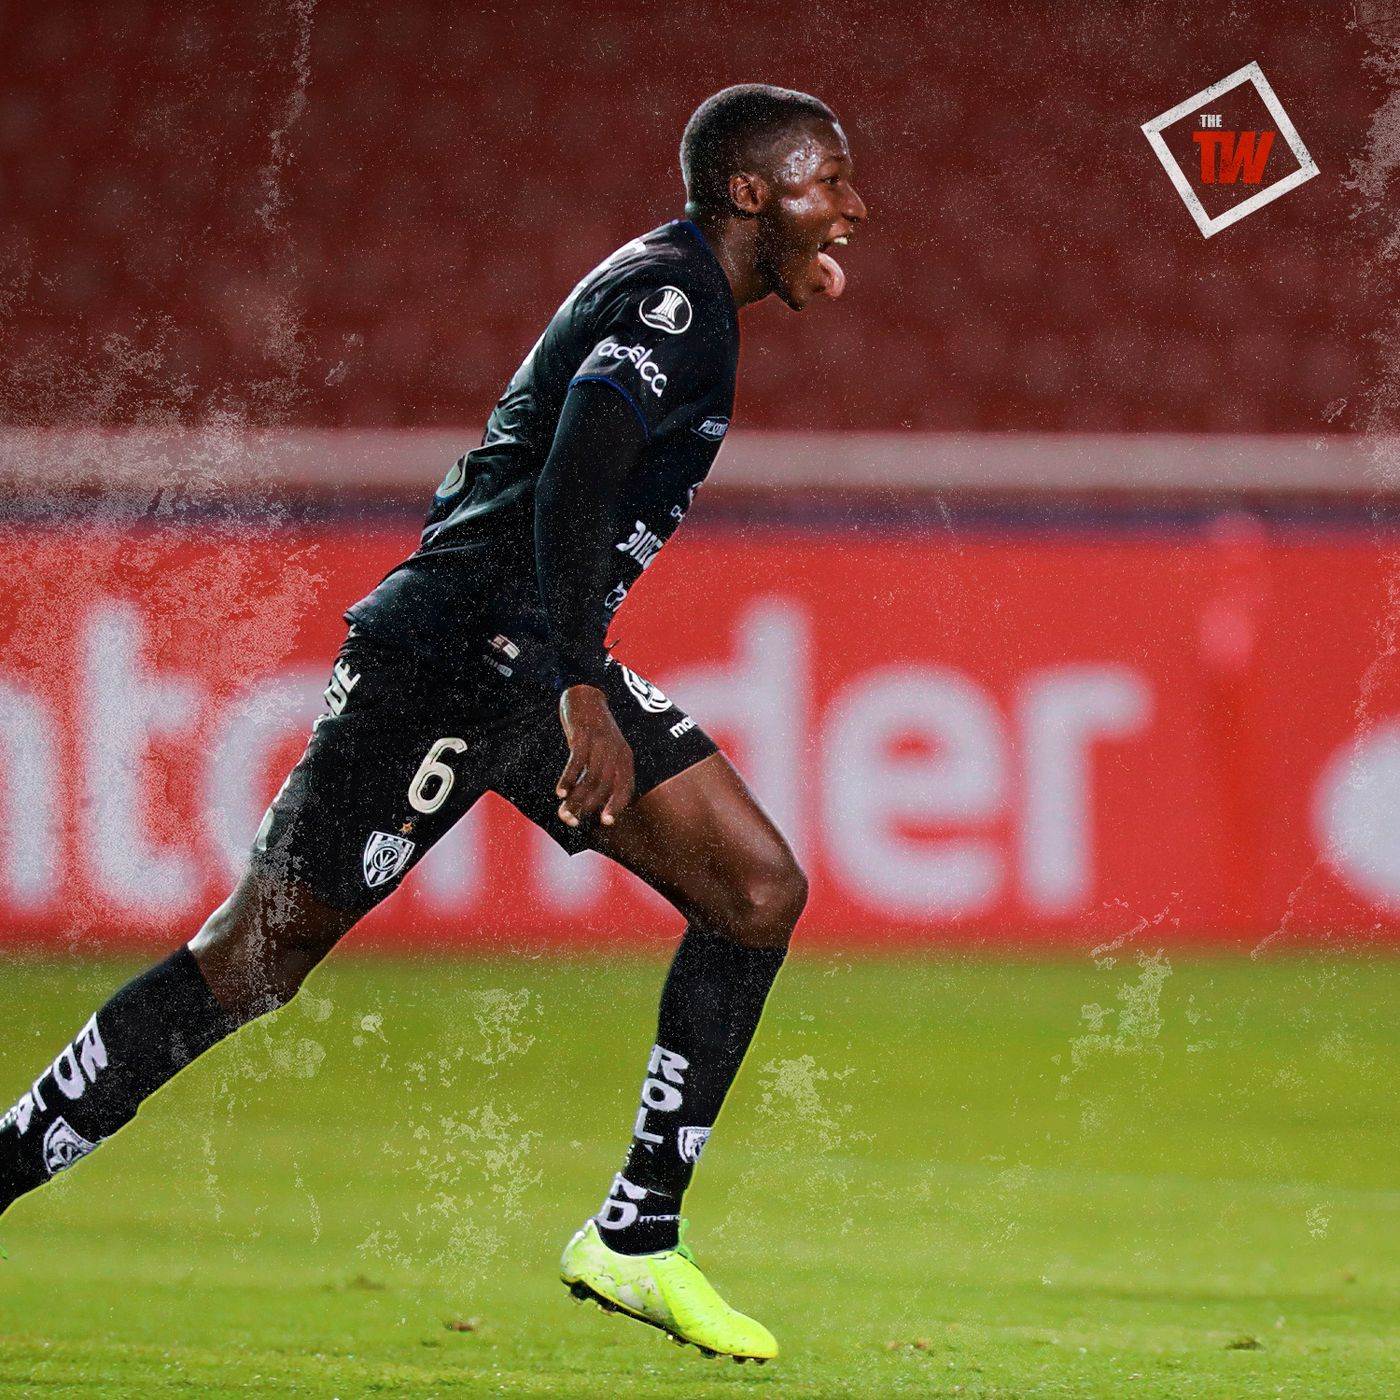 Caicedo's complex transfer | Arsenal, Liverpool assess Bissouma | Man Utd wait + see | Slimani to Lyon; Dembele to Atletico